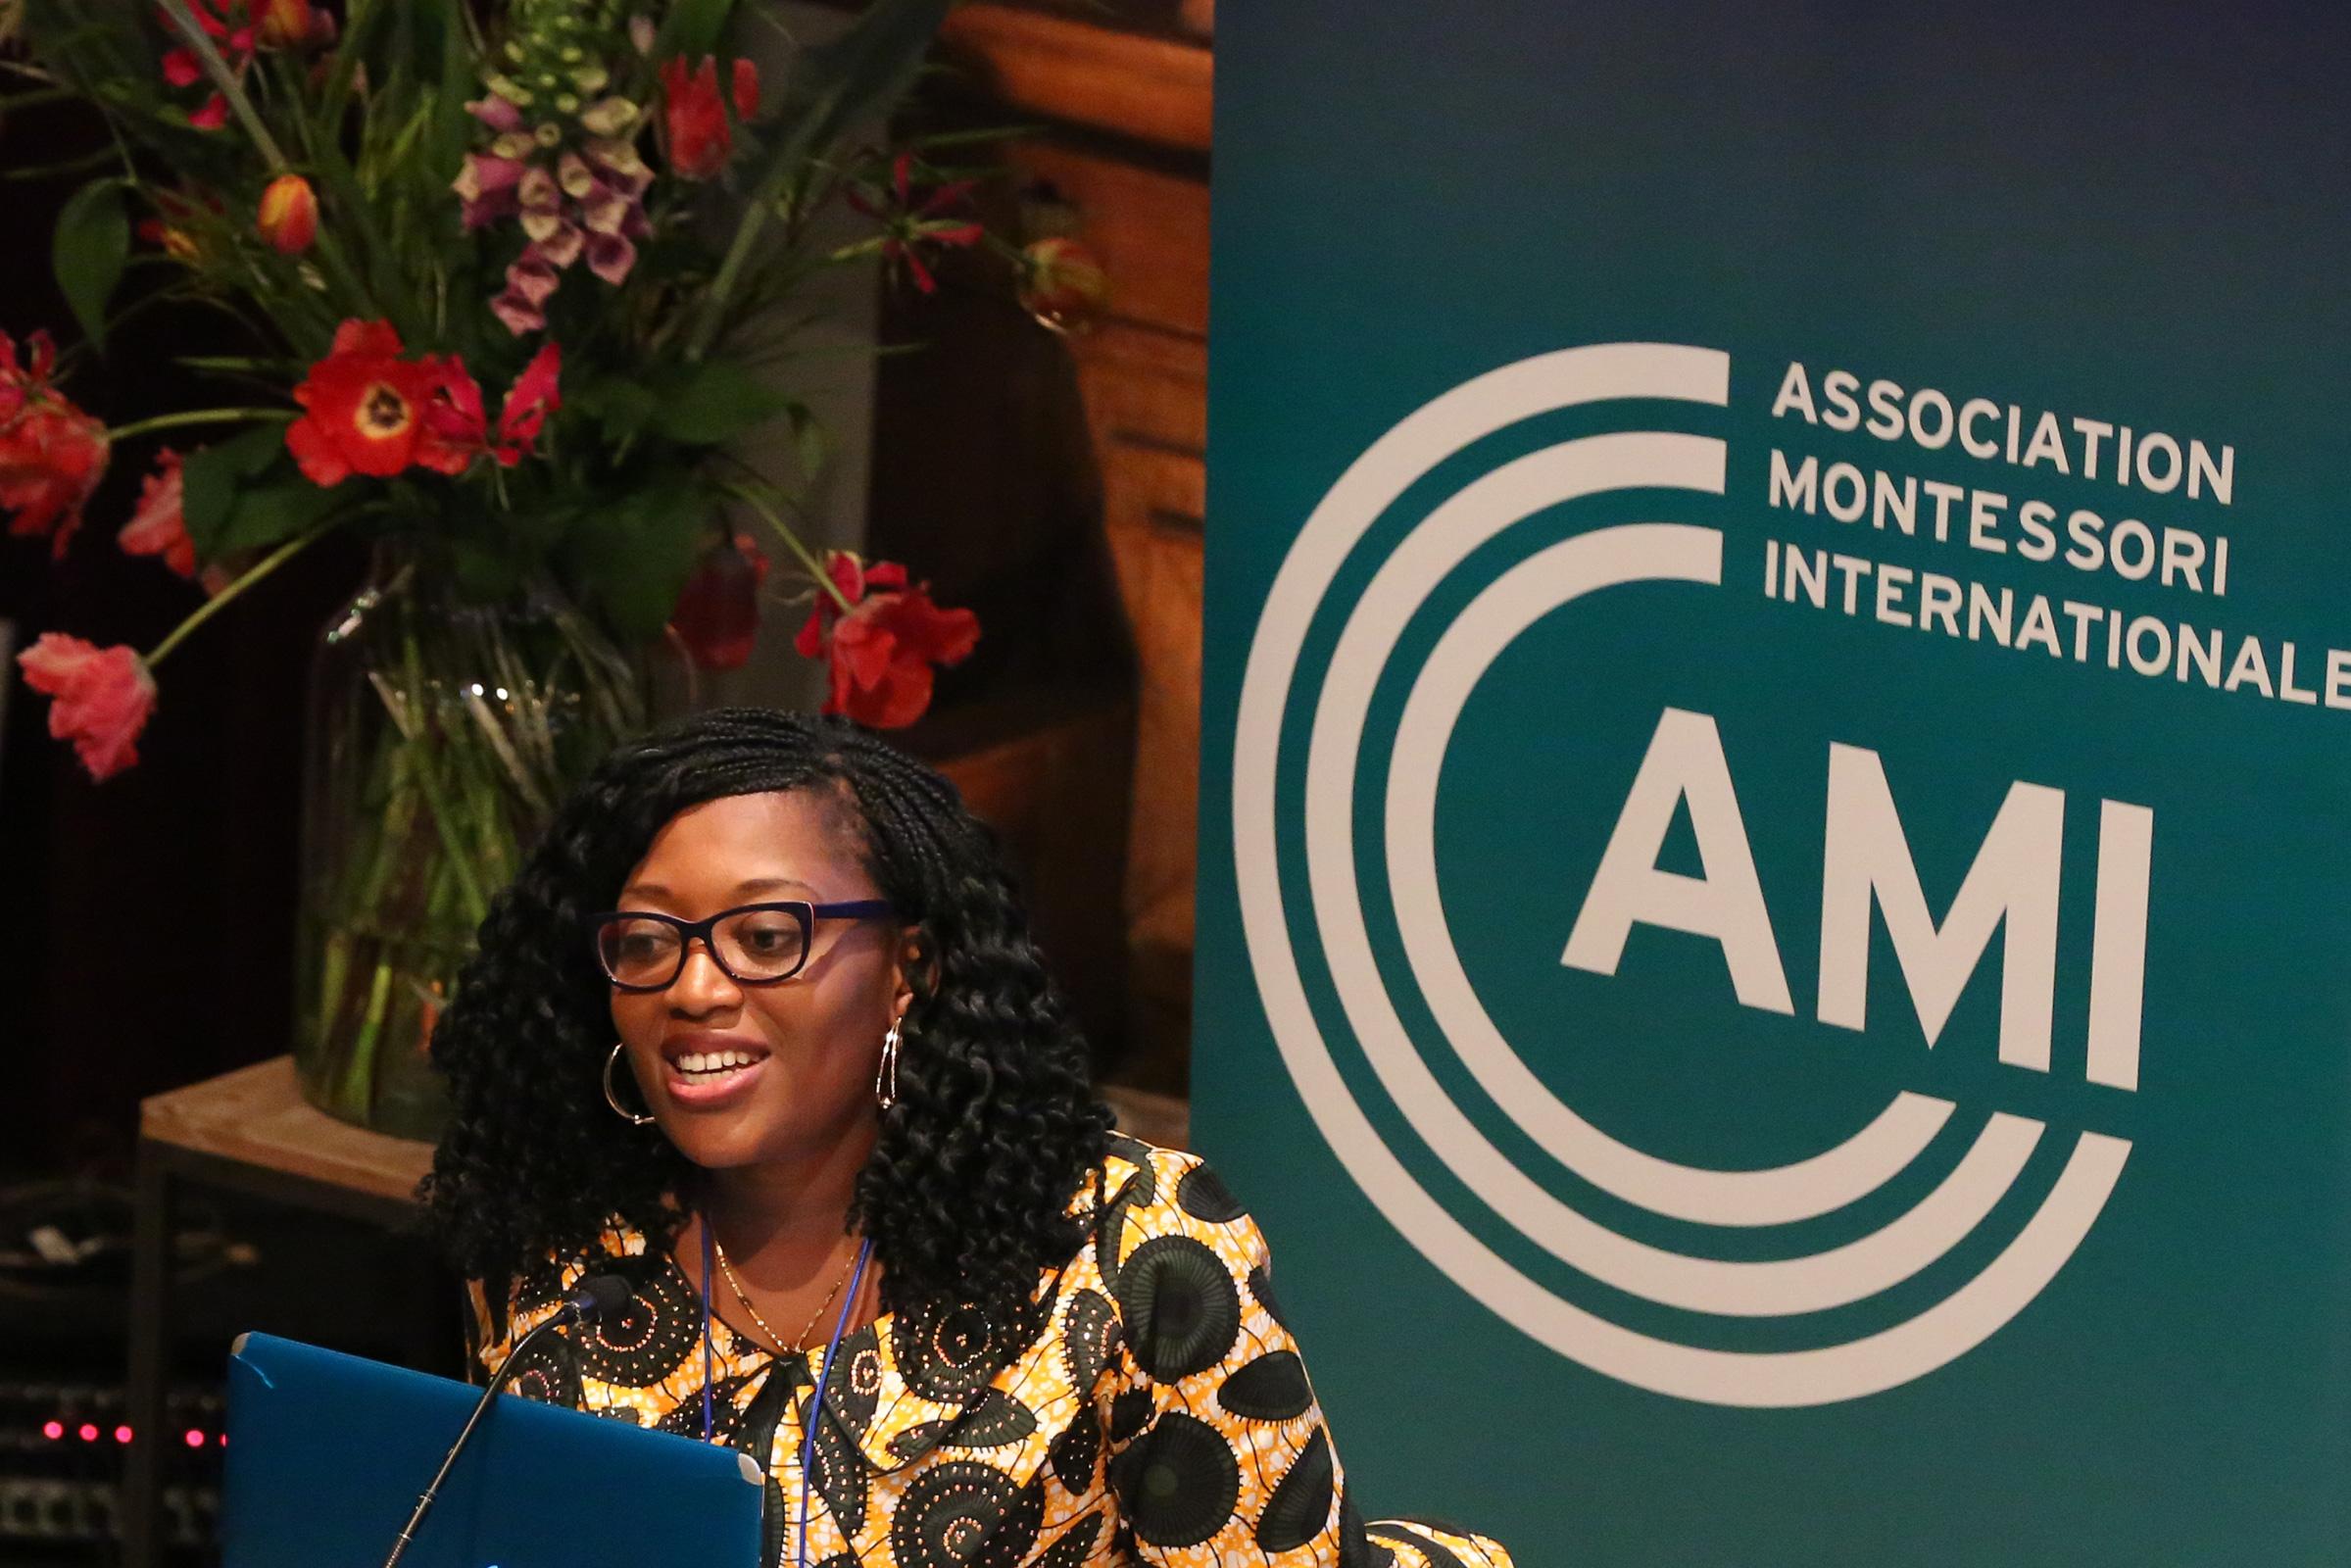 2018 AMI AGM Proceedings and Photos